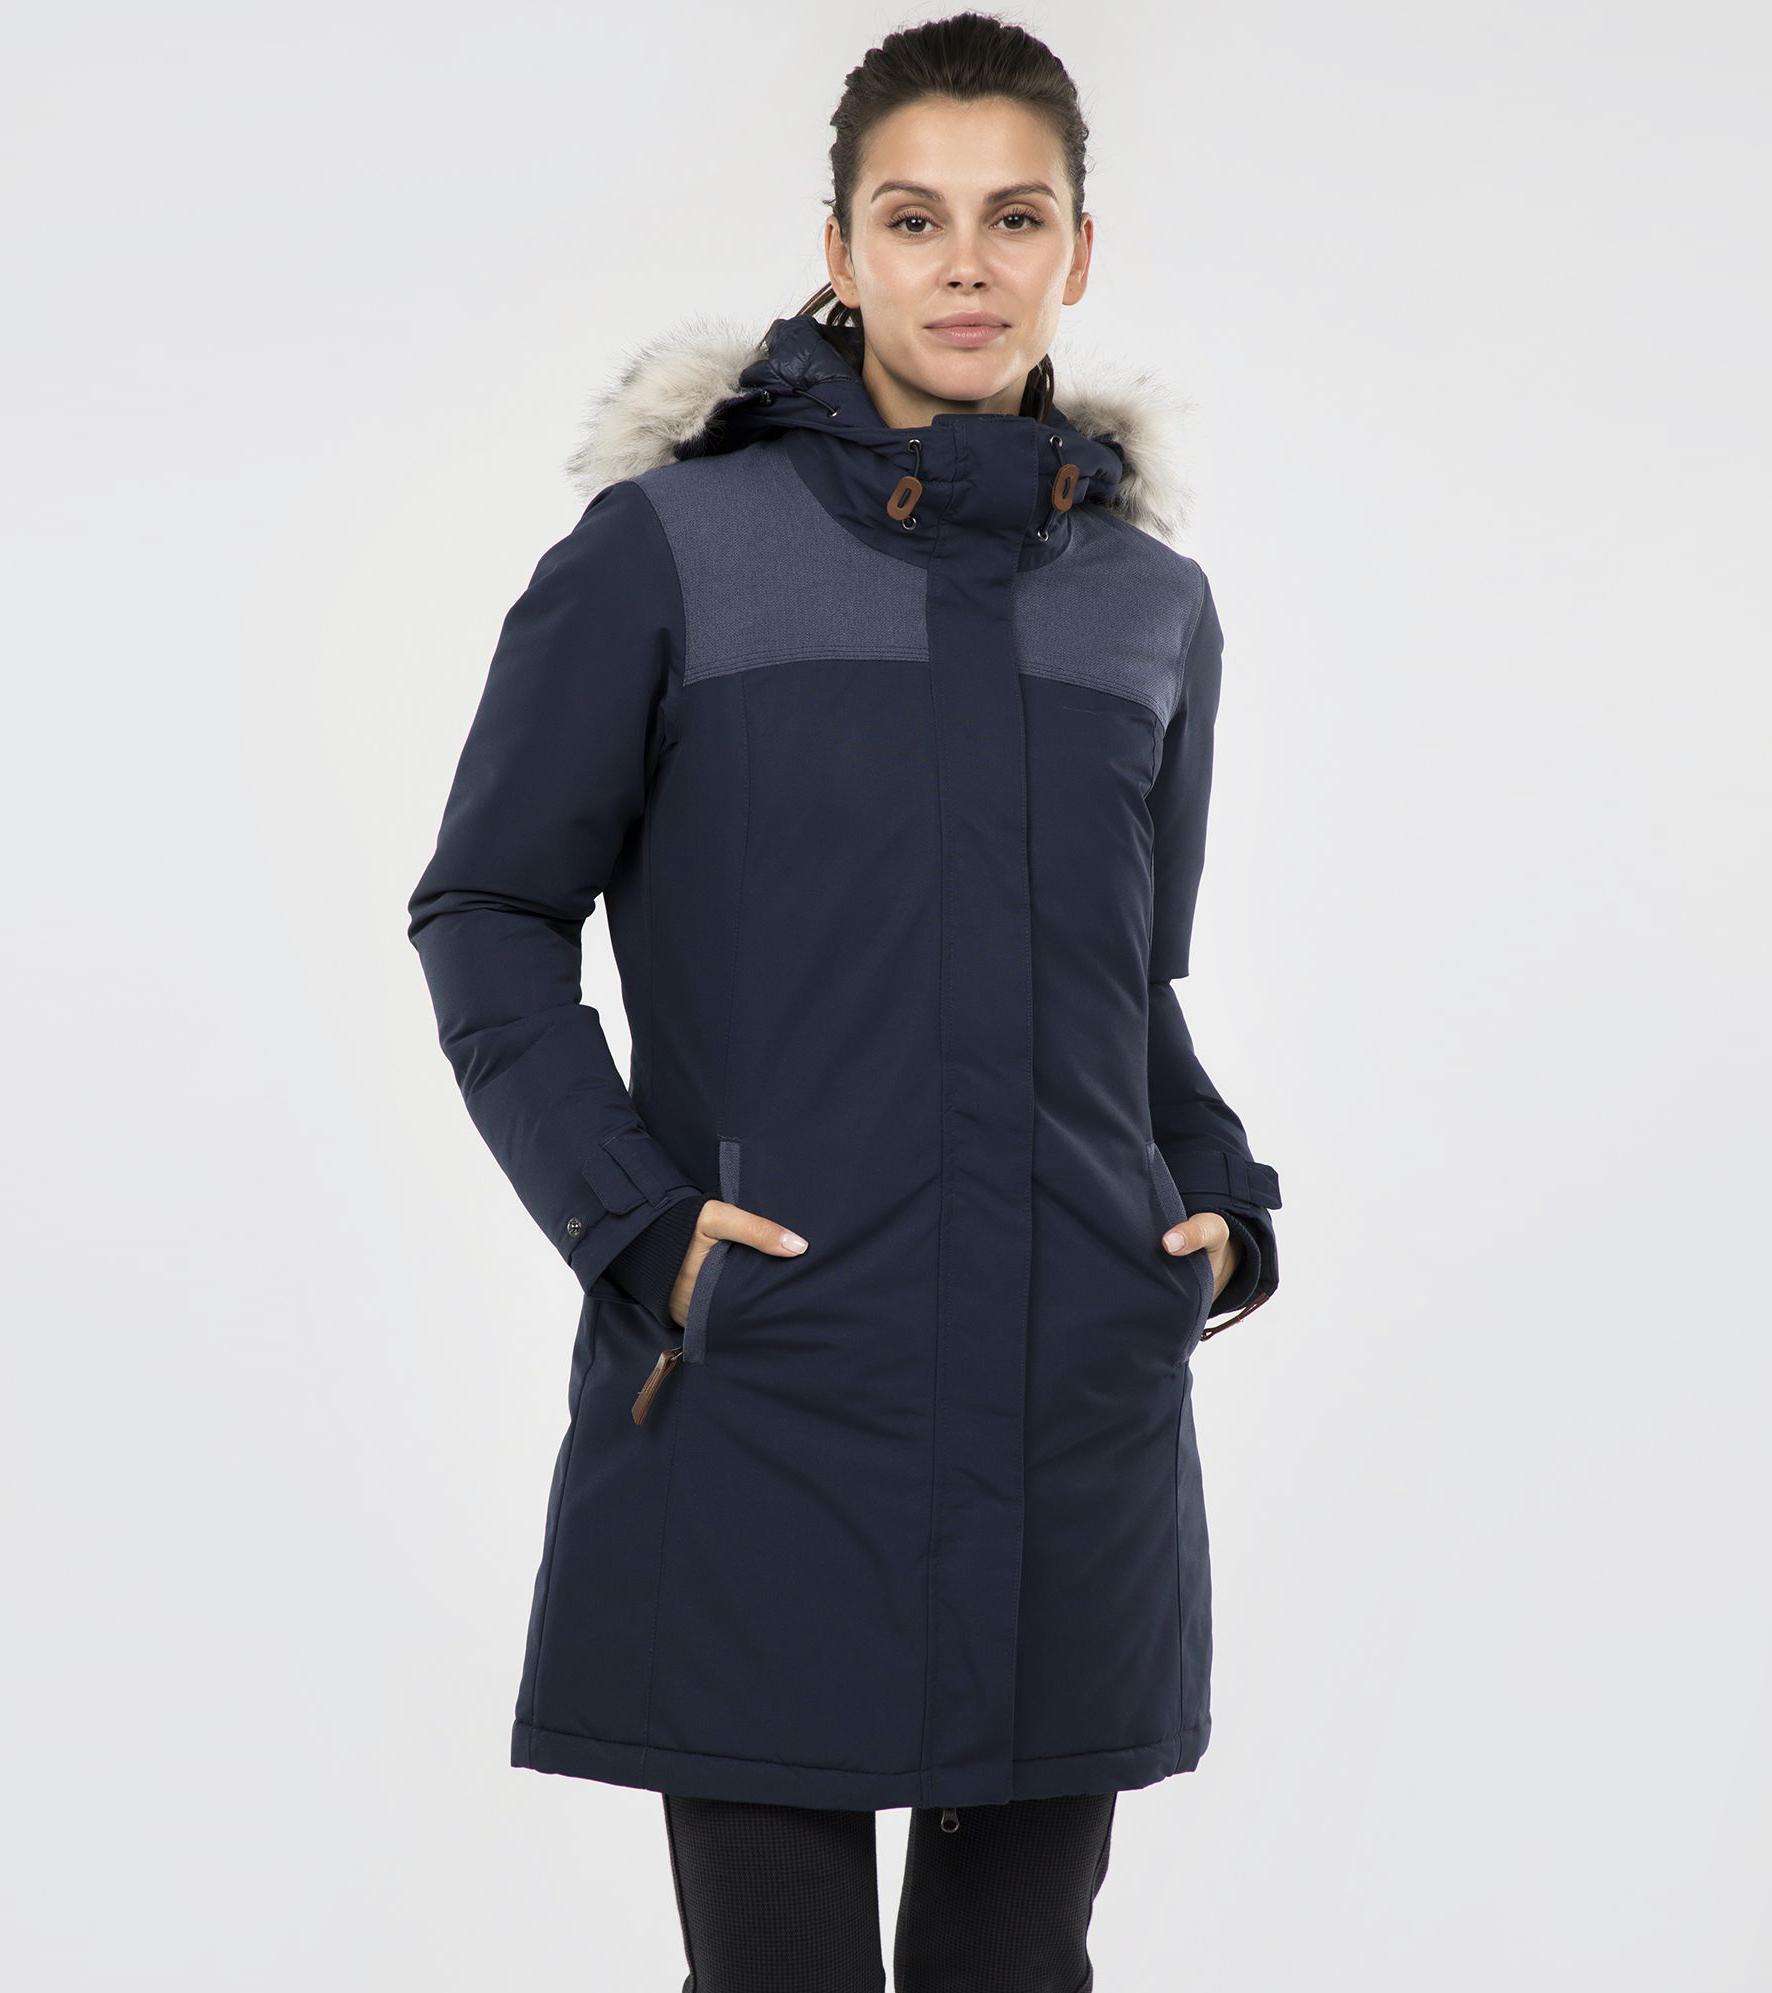 Columbia Куртка утепленная женская Columbia Lindores, размер 50 columbia куртка утепленная женская columbia windgates размер 50